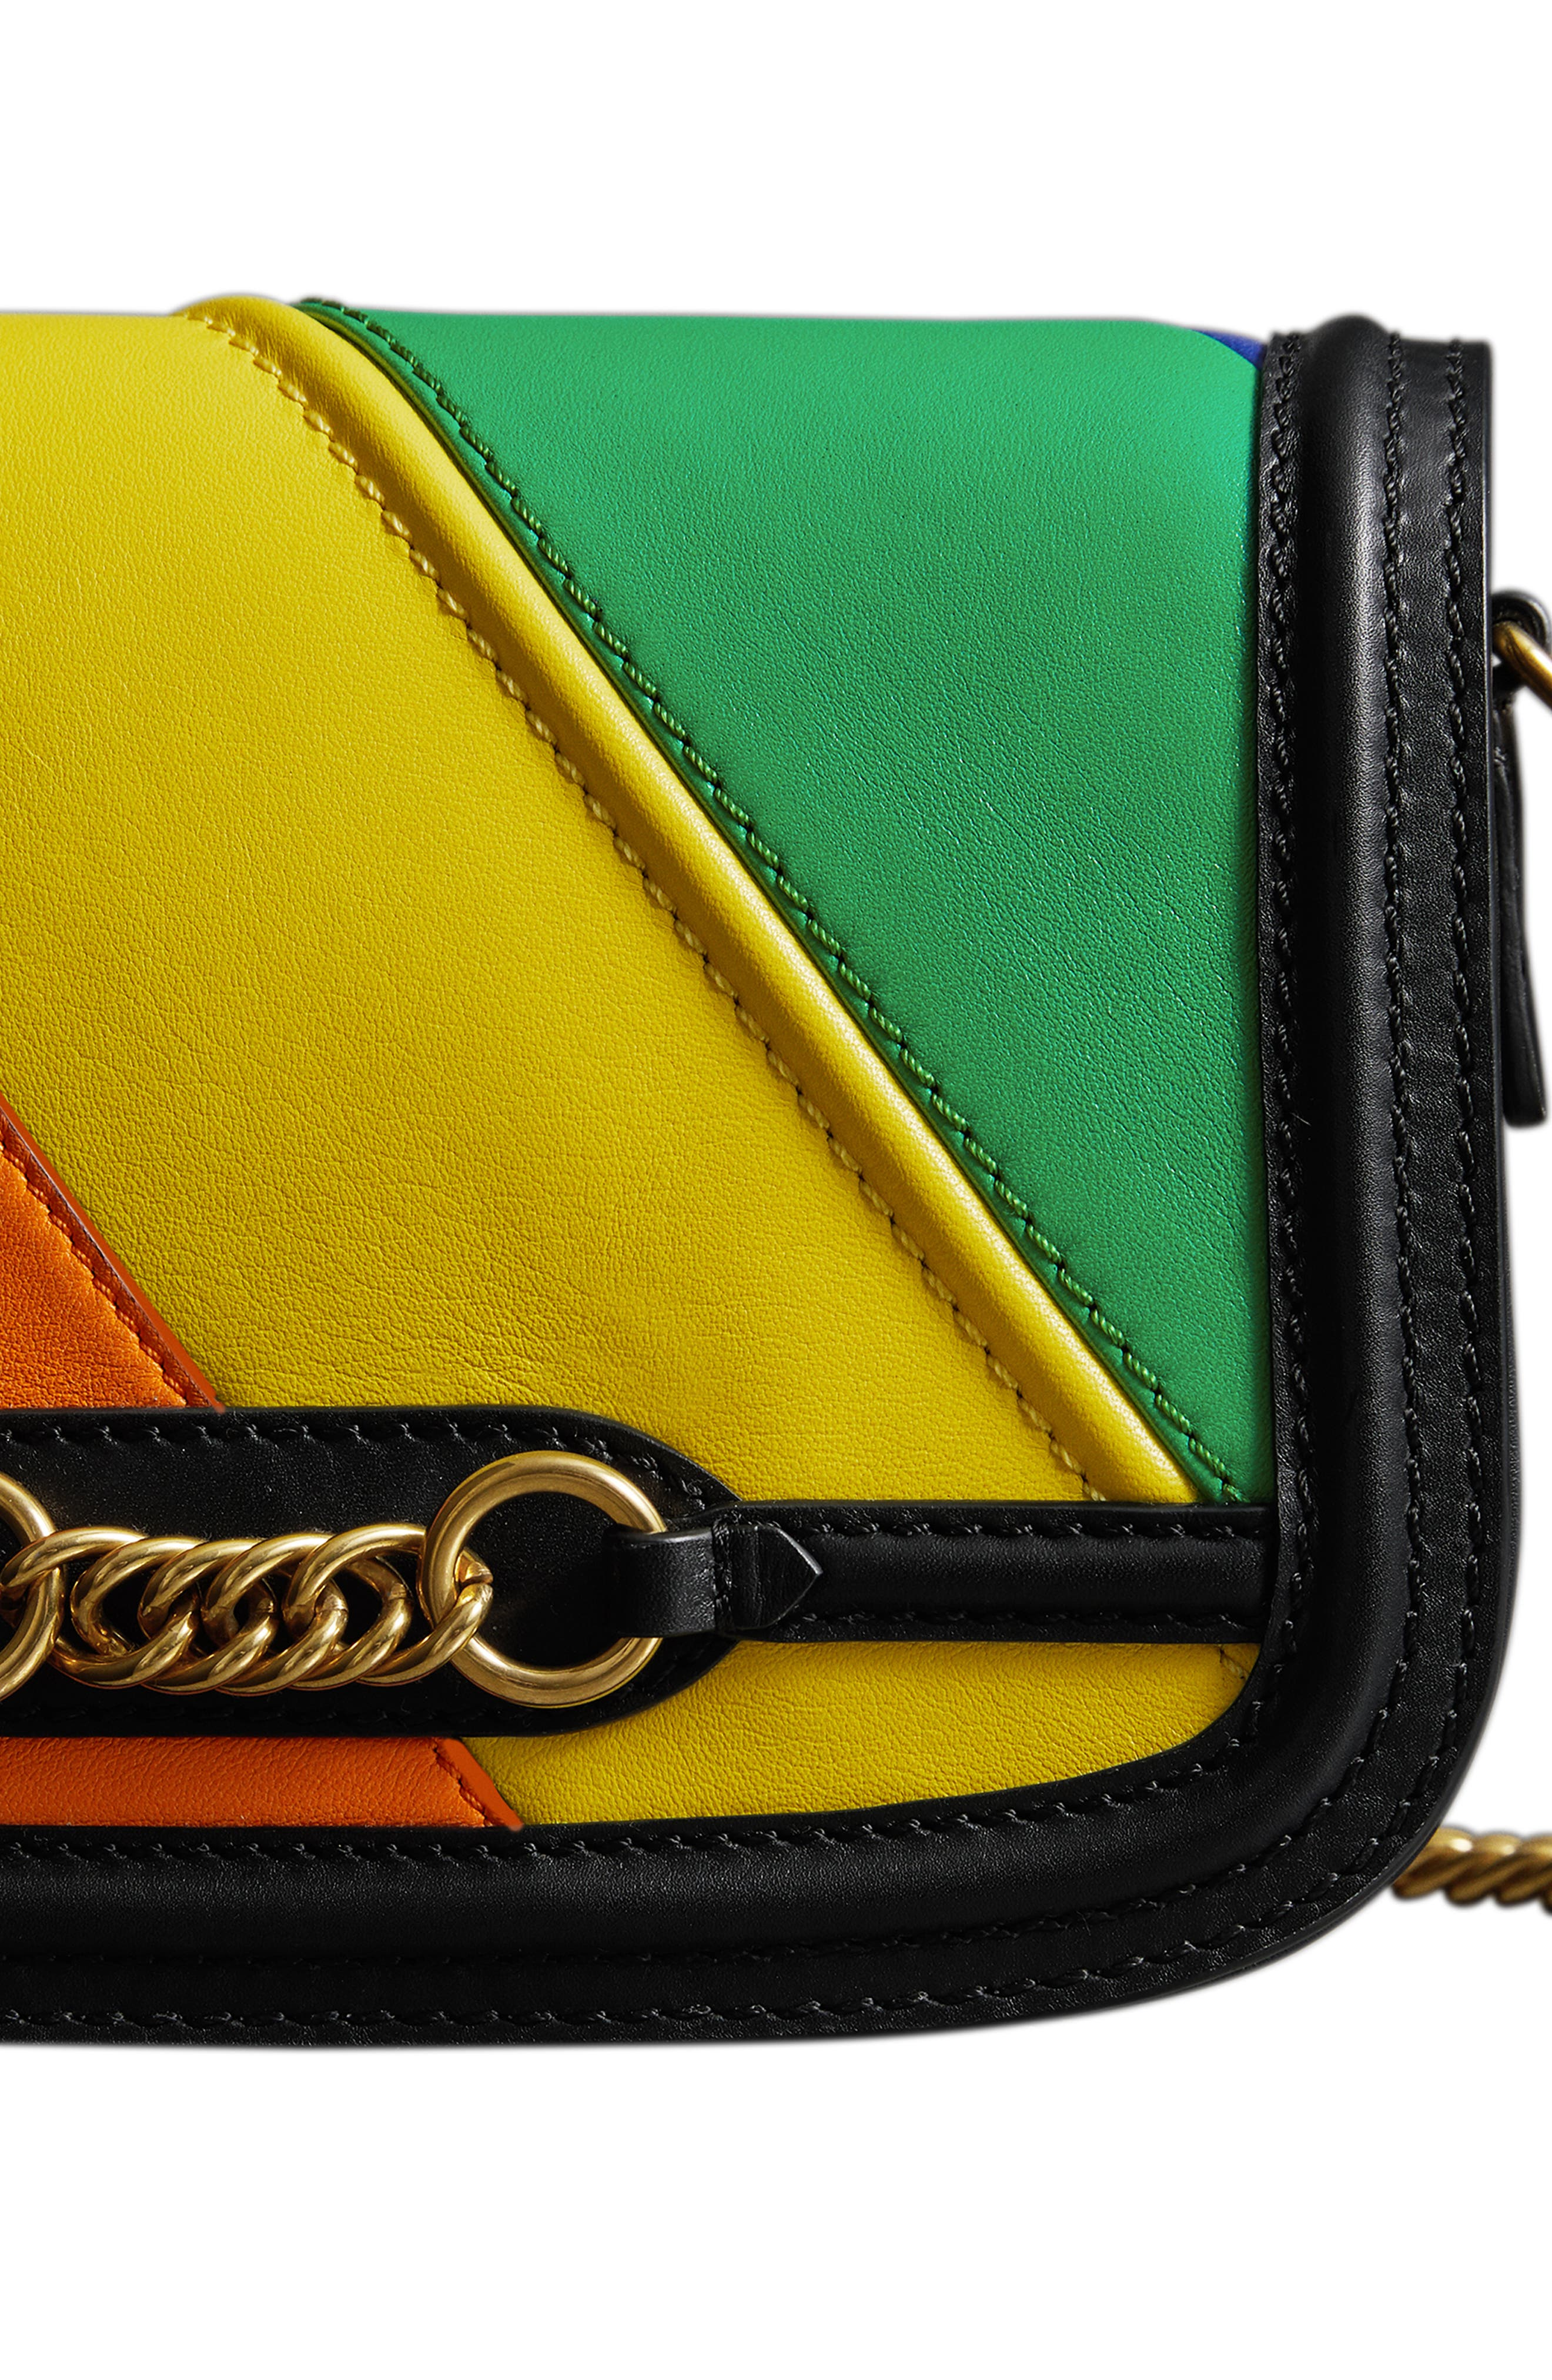 Rainbow Stripe Link Flap Leather Crossbody Bag,                             Alternate thumbnail 5, color,                             001